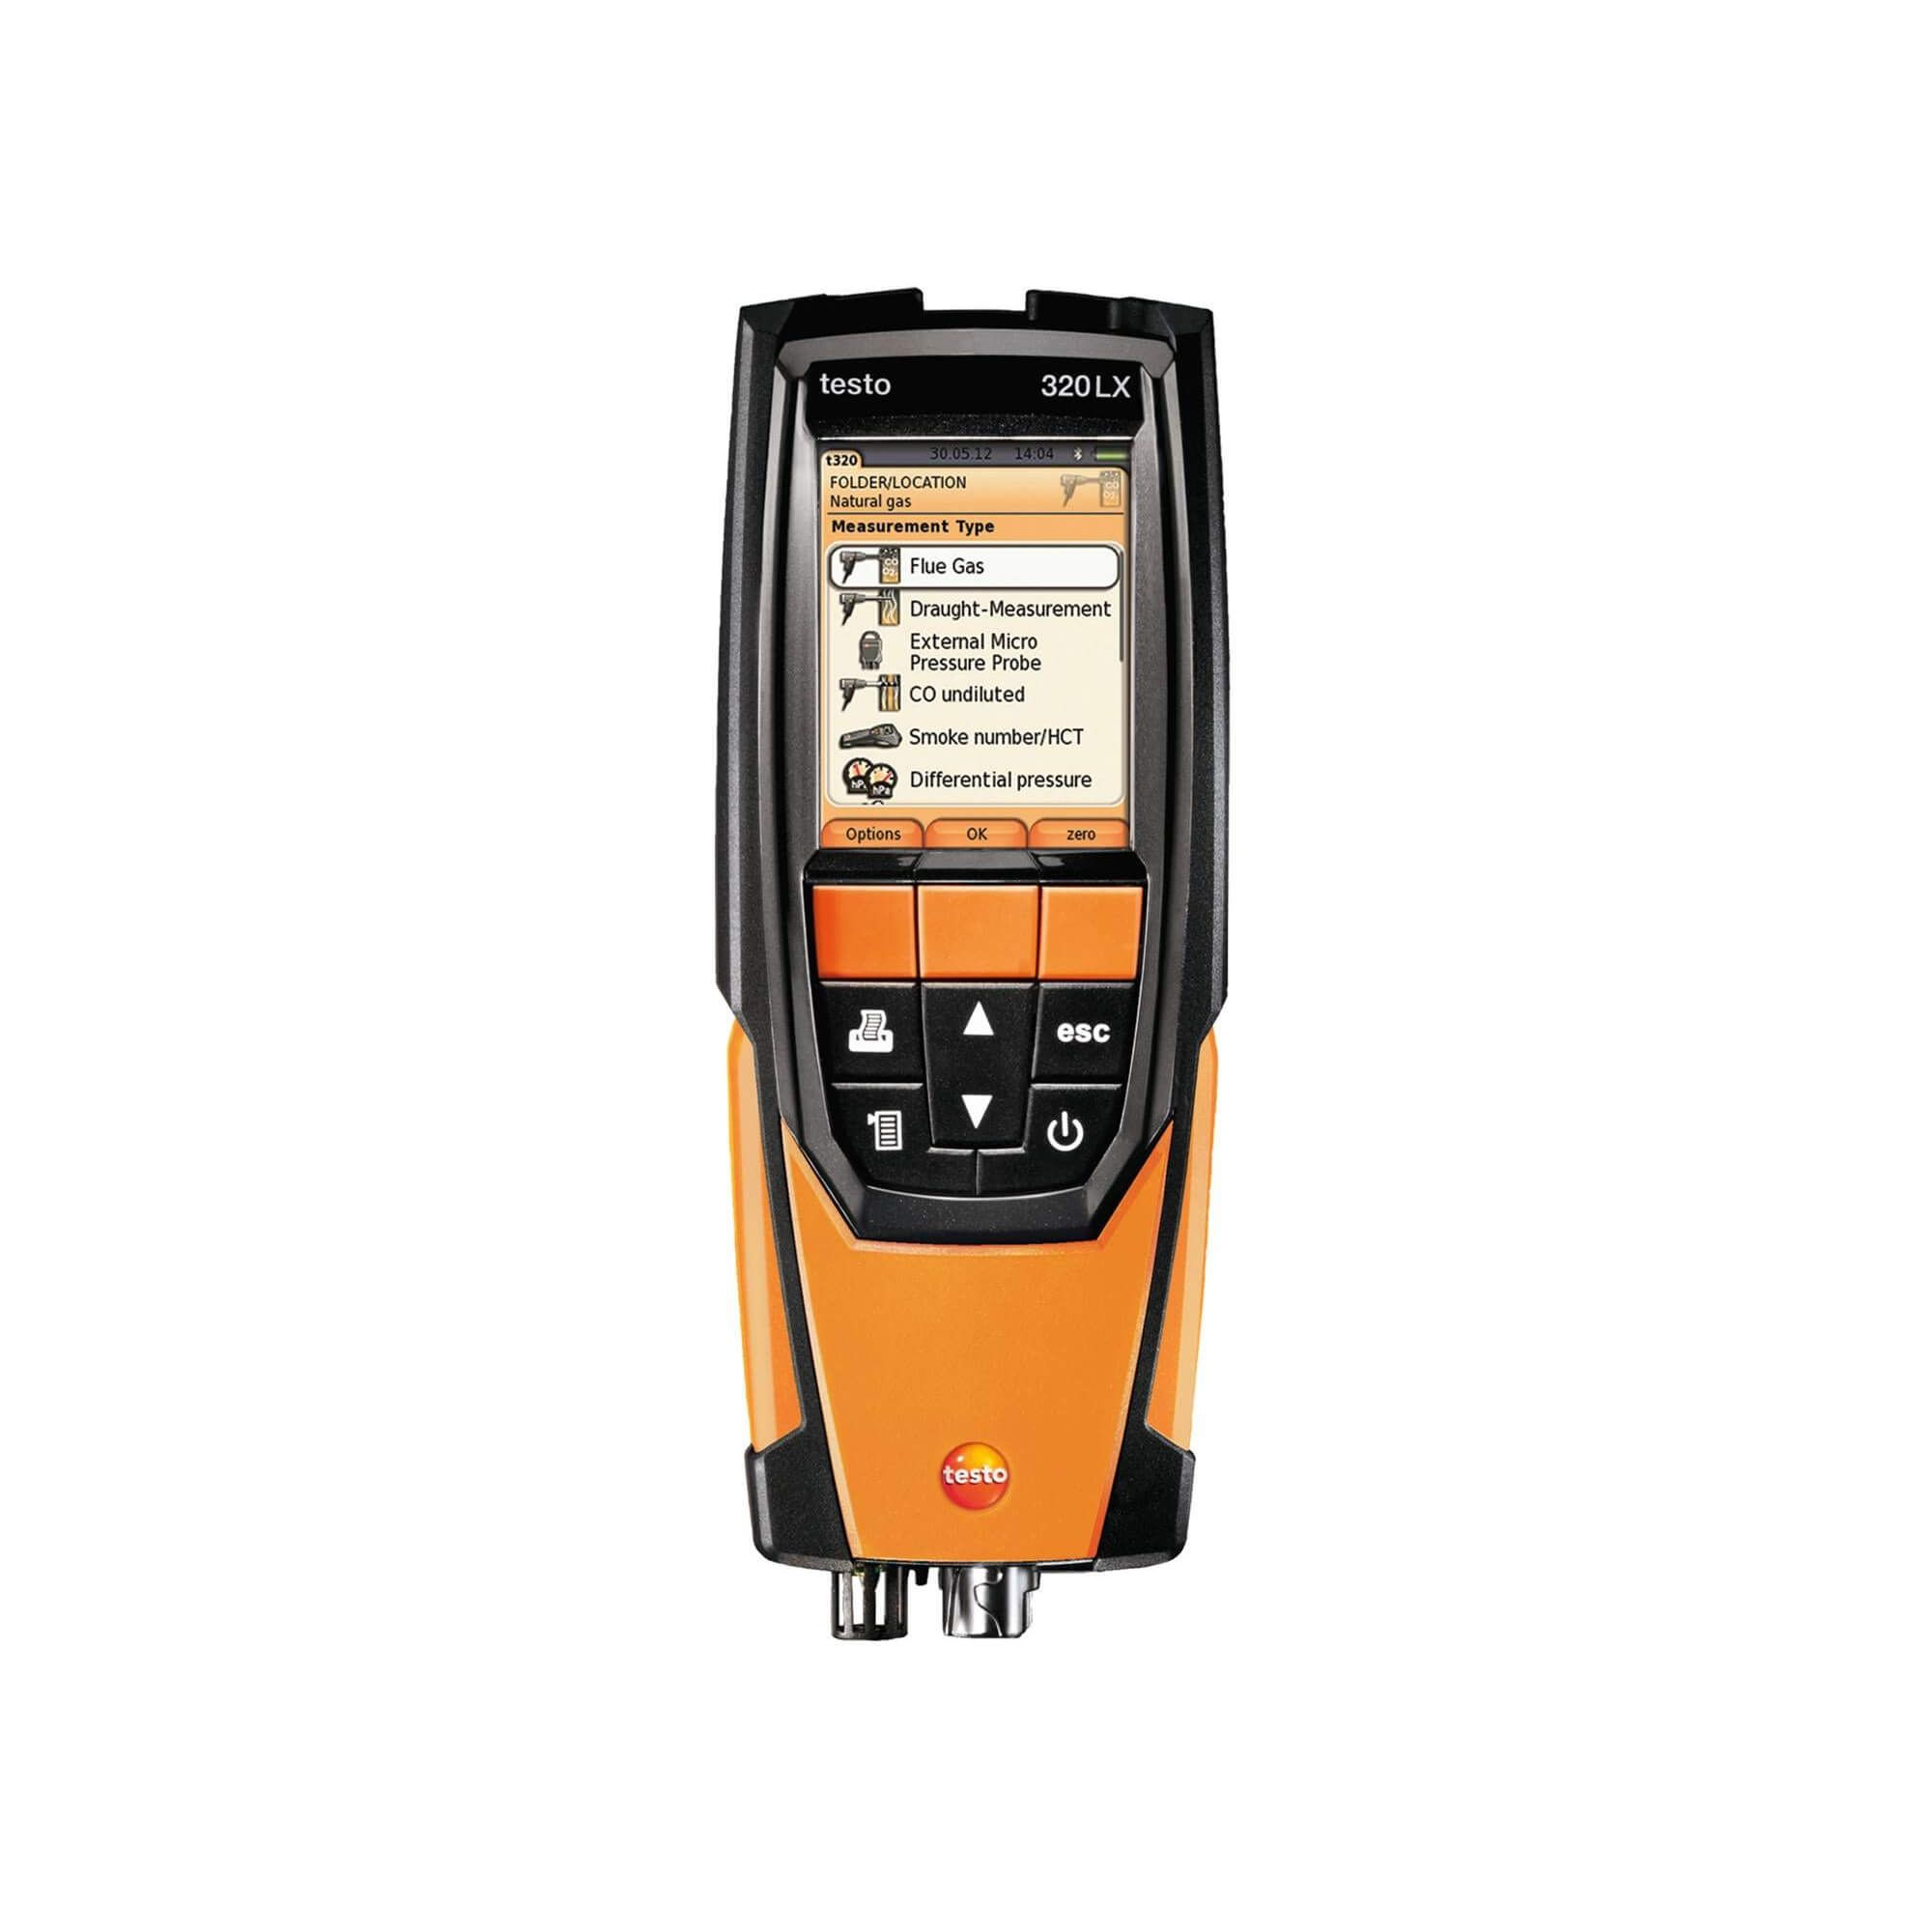 Testo 320 Combustion Analyzer 0563 3220 70 Valuetesters Com Thermal Imaging Cameras Hvac Tools Heating Hvac